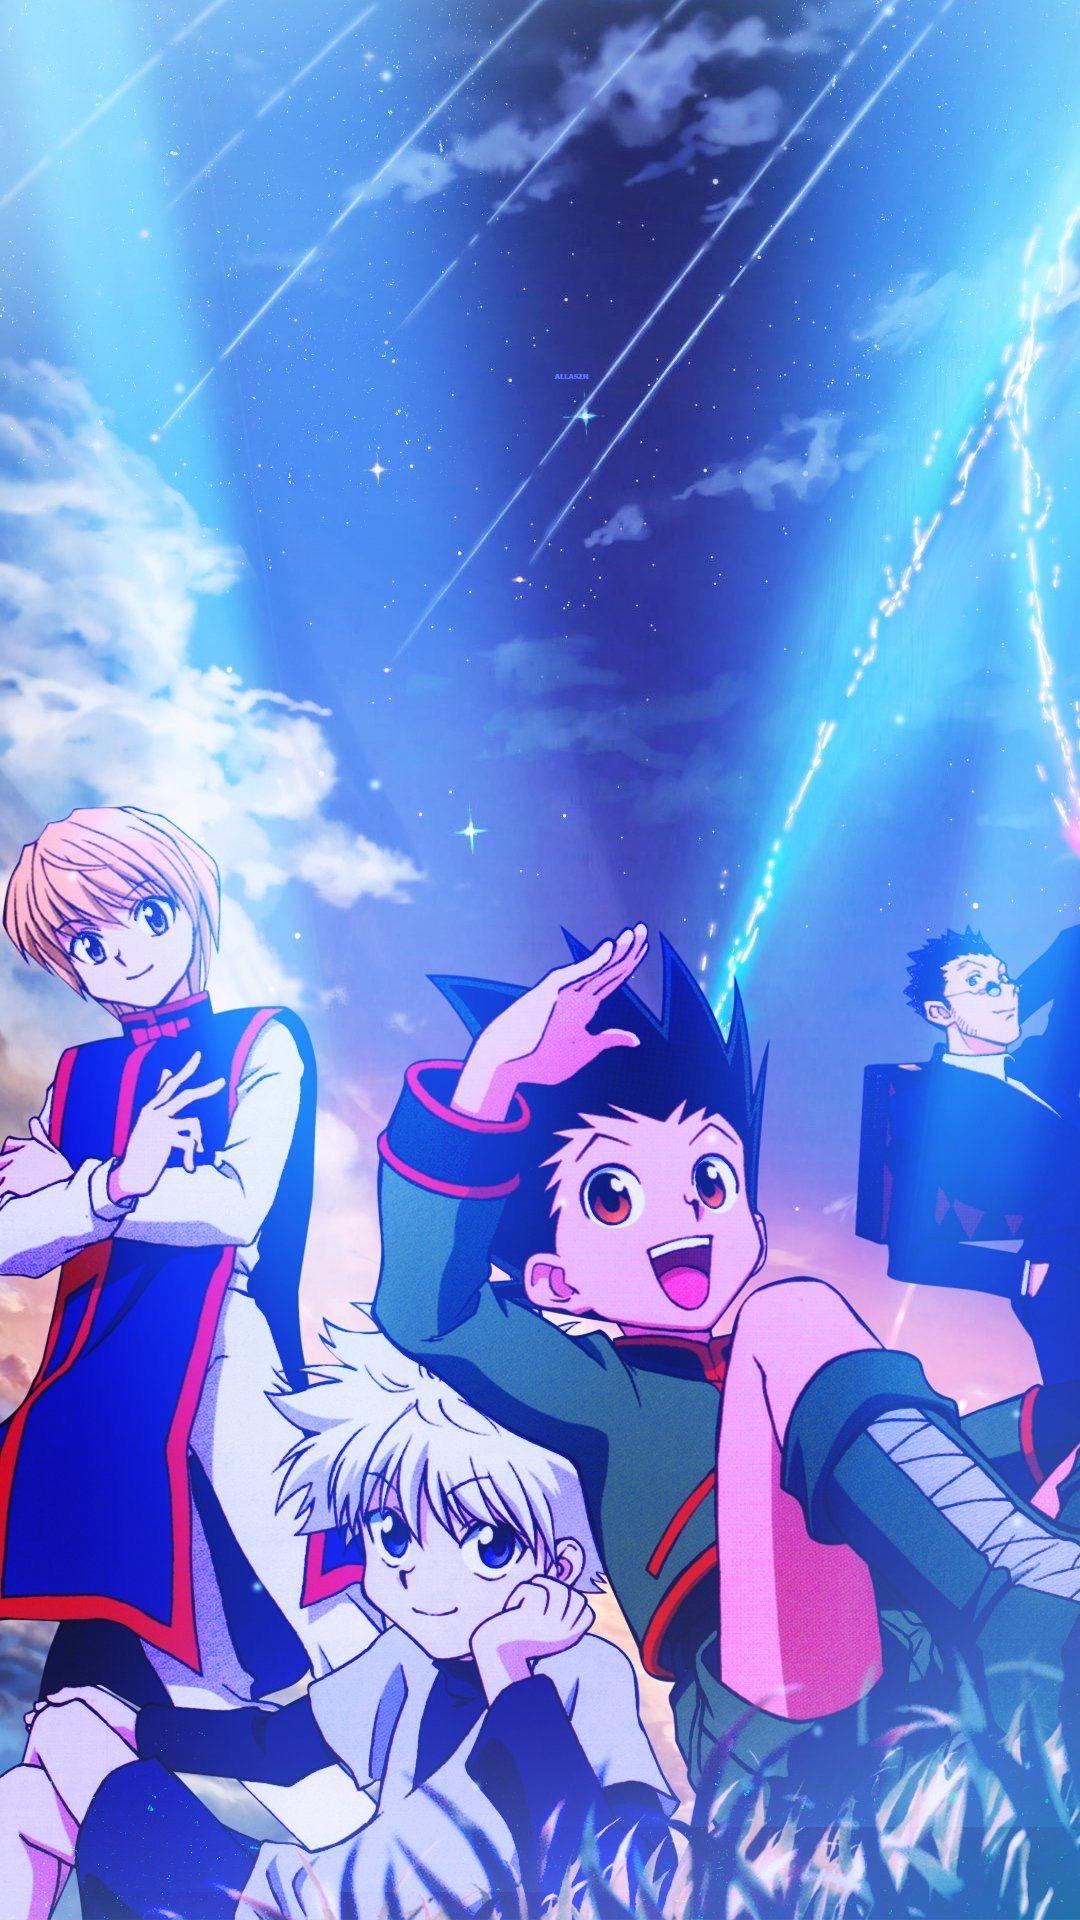 Pin By Enzo On Anime Guy Hunter Anime Anime Hunter X Hunter